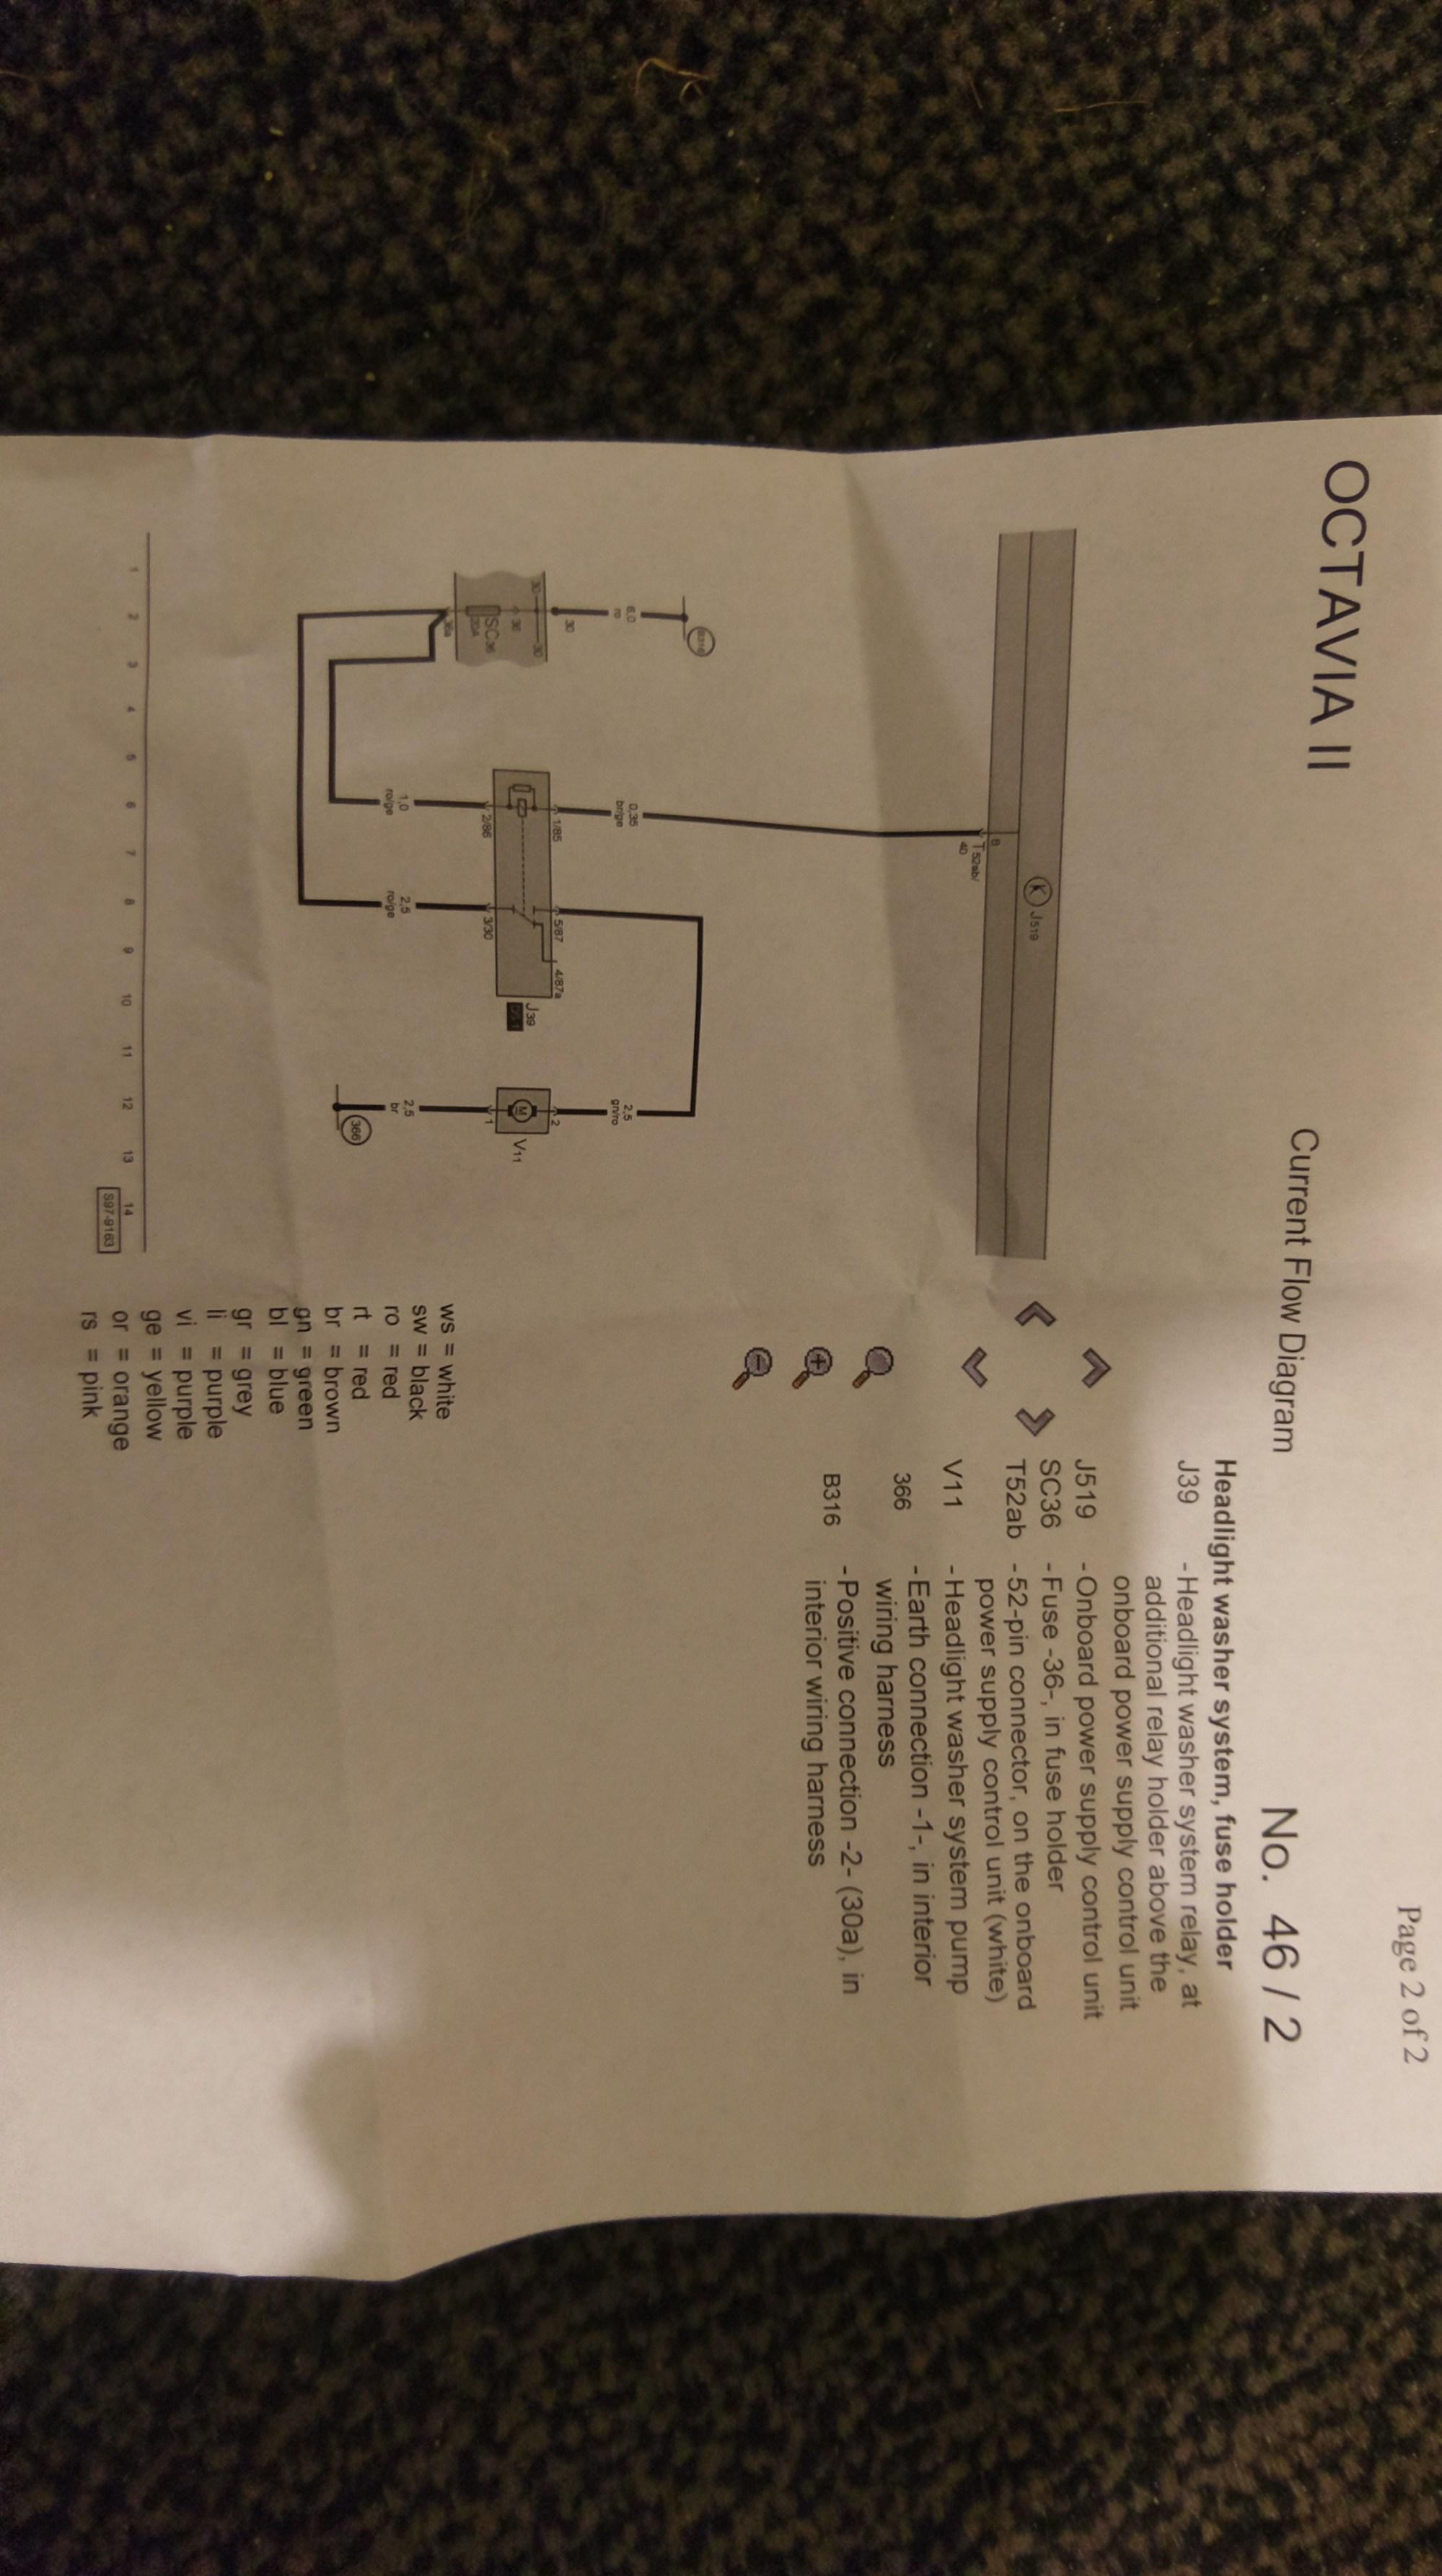 hight resolution of headlight washer relay and wiring skoda octavia mk ii 2004 2013 skoda octavia headlight wiring diagram